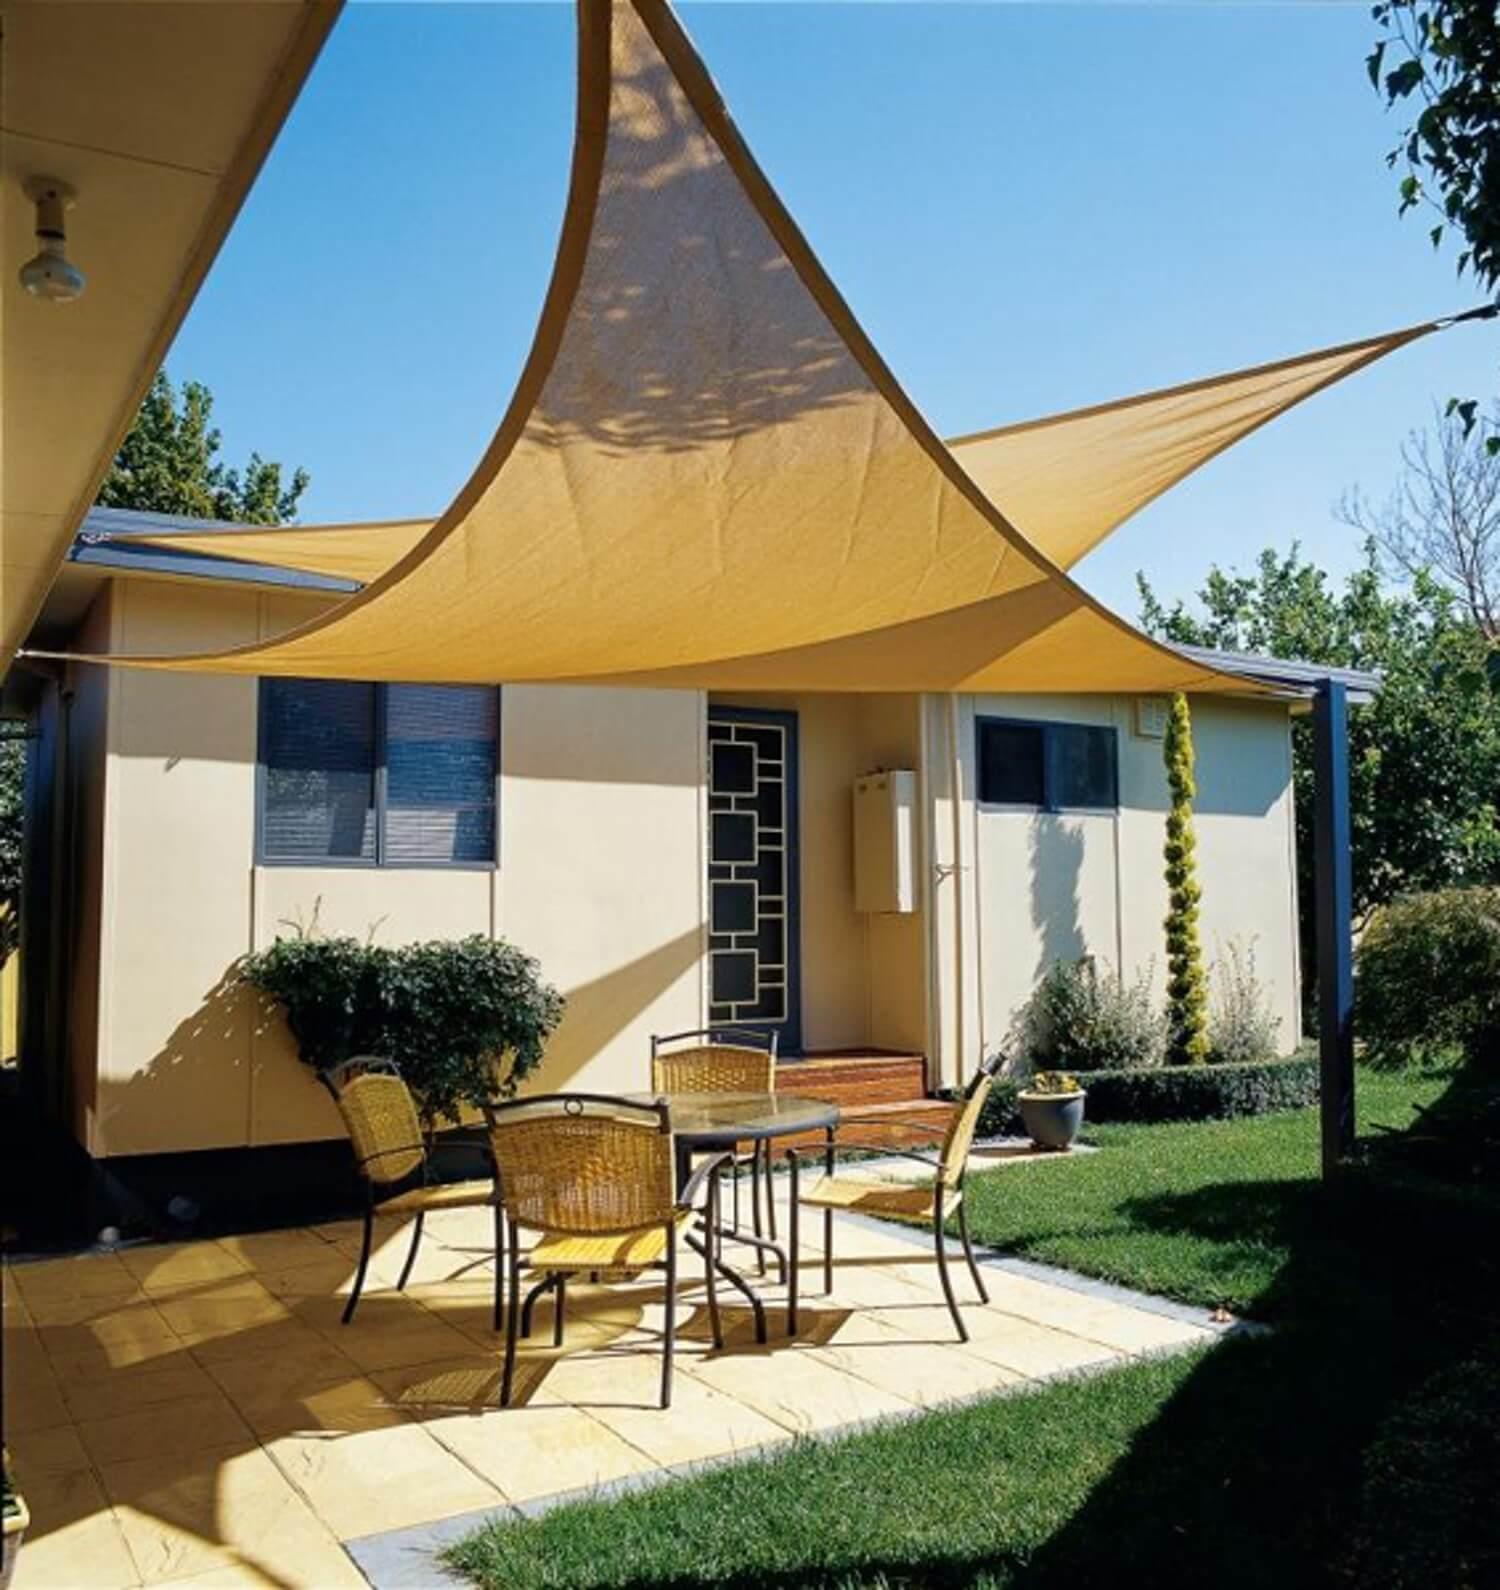 22 overlapping backyard sun sails - Inexpensive Patio Shade Ideas